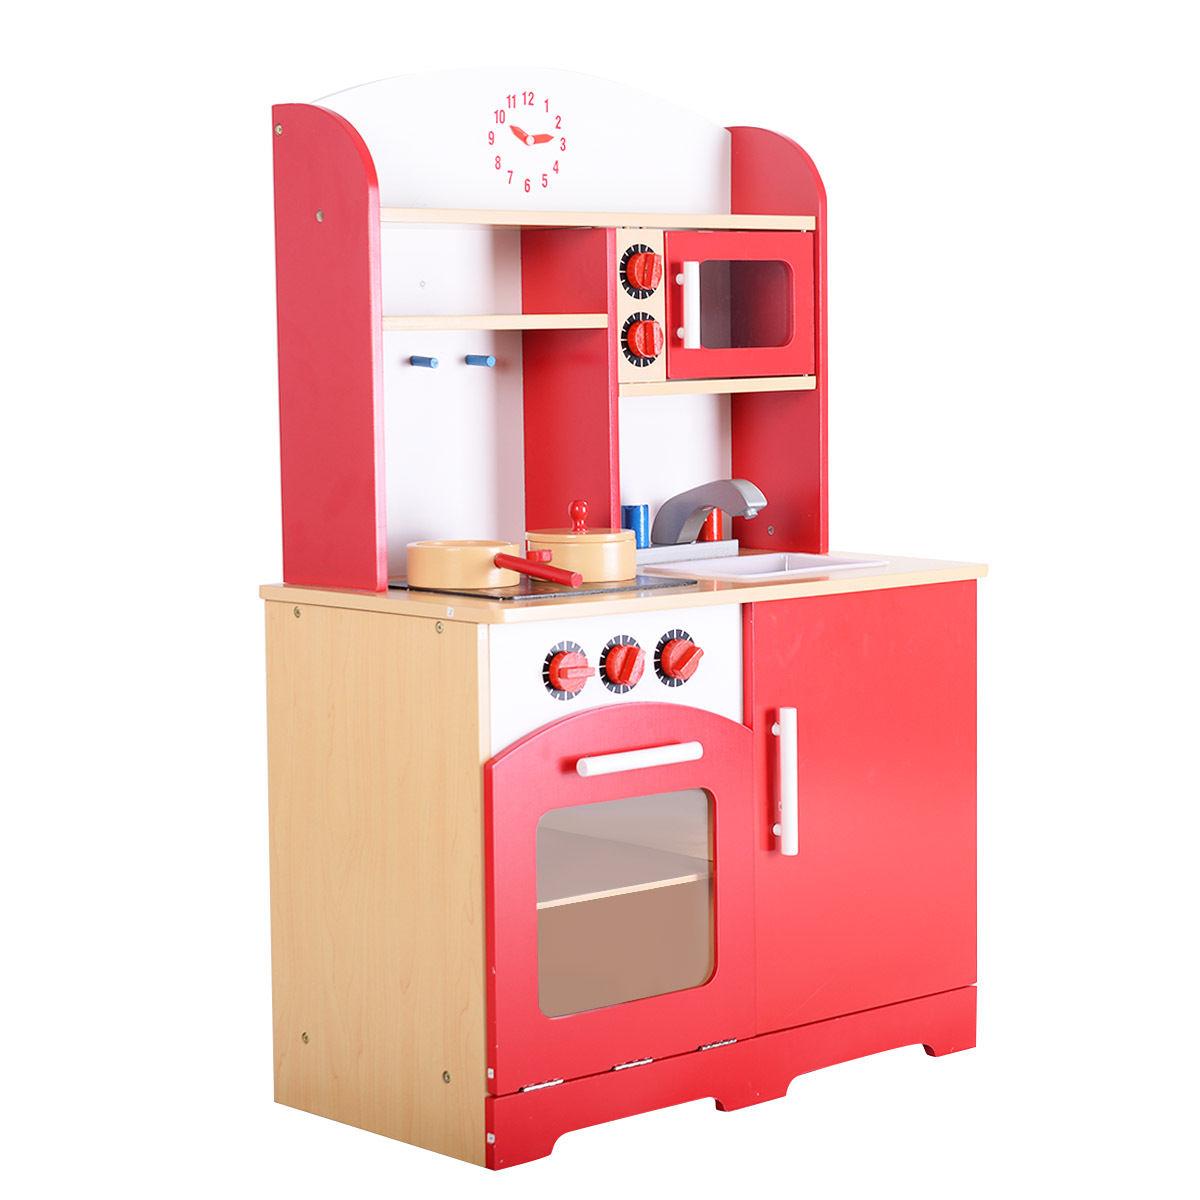 kid kitchens laminate kitchen flooring kids sets costway wood toy cooking pretend play set toddler wooden playset